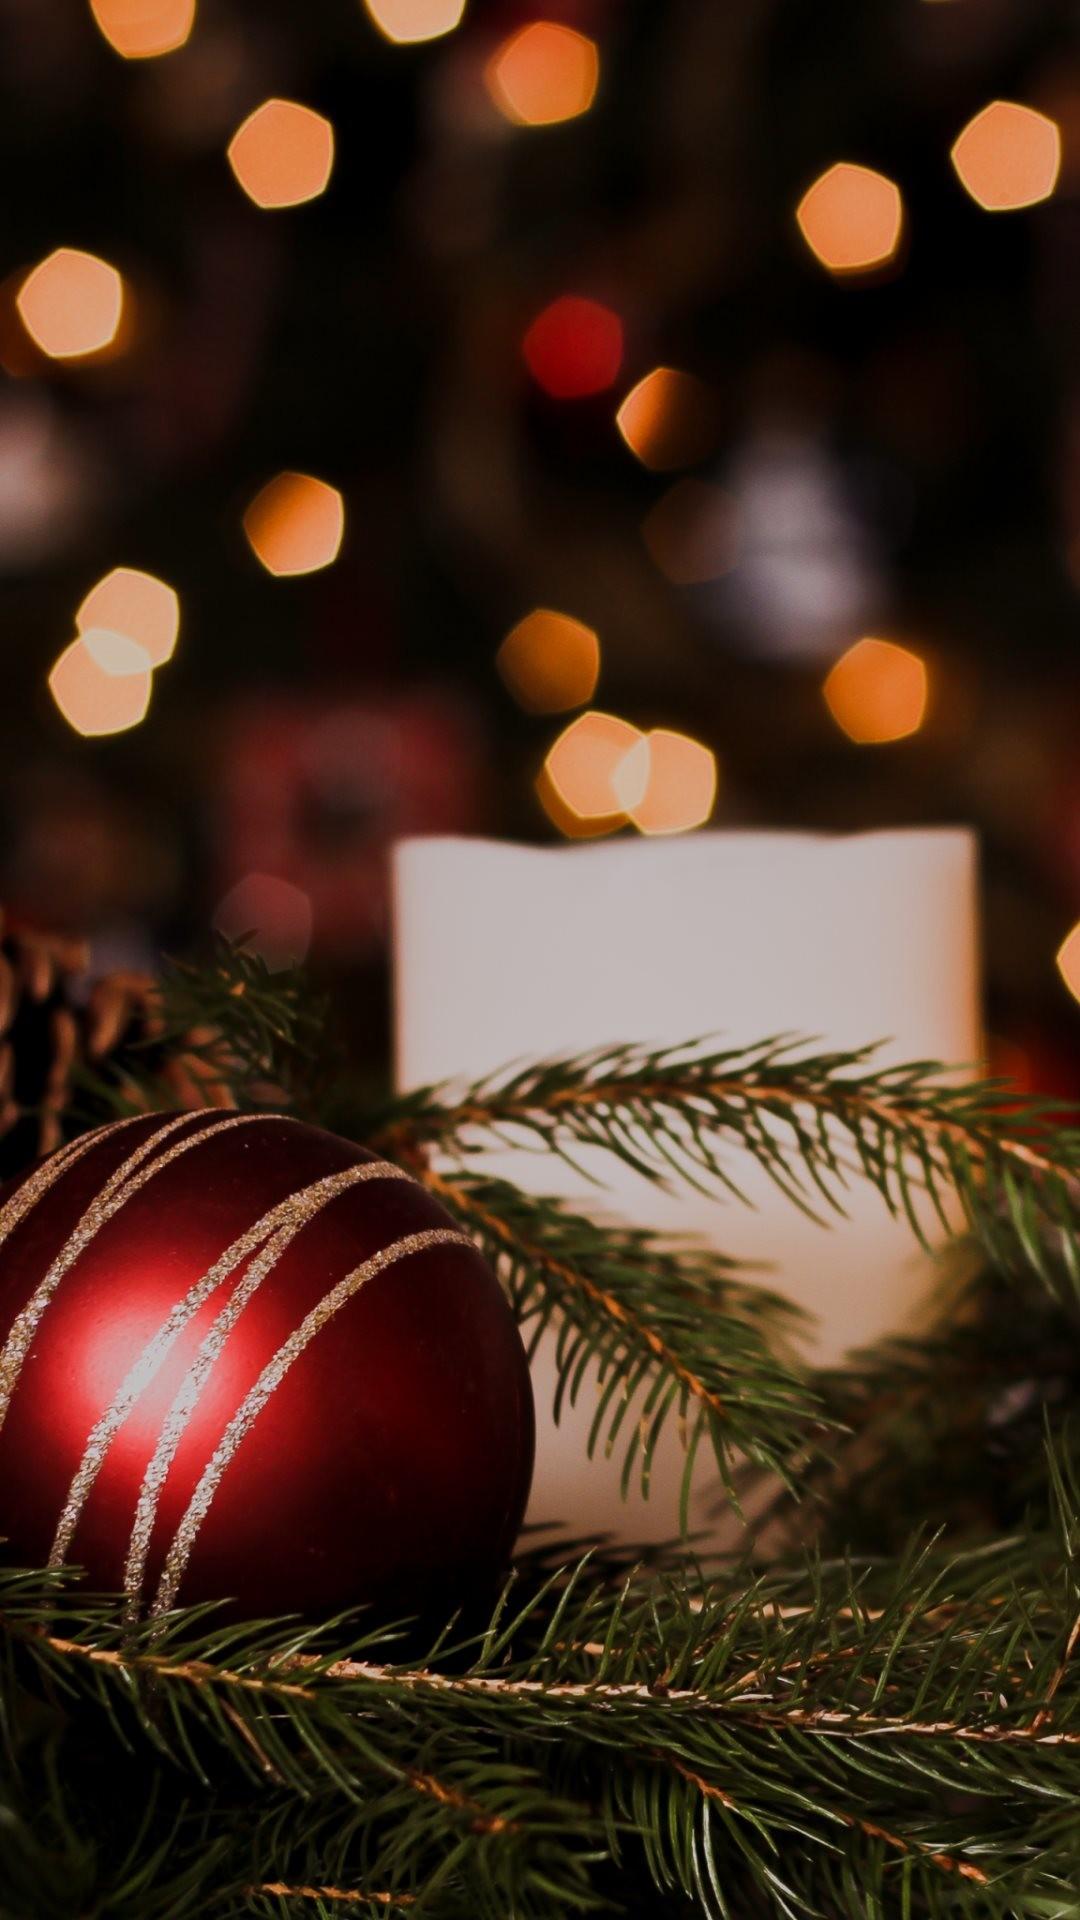 1080×1920-decoration_christmas_decorations_light_holidays_christmas